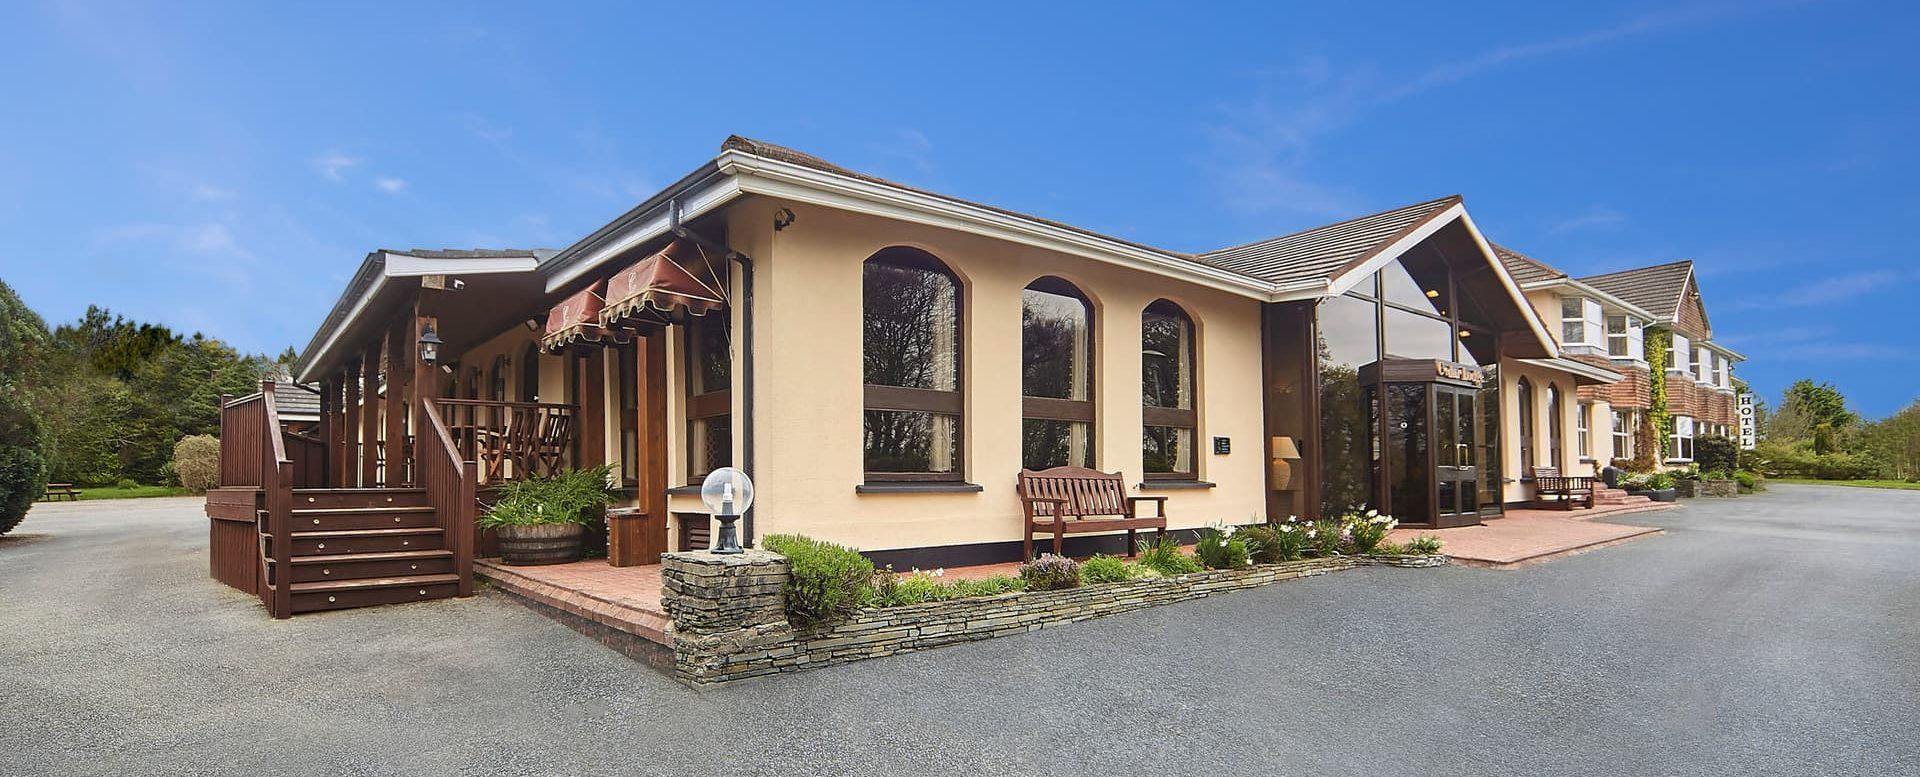 Cedar-Lodge-Hotel-Wexford-Ireland.min_-e1547741424169.jpg